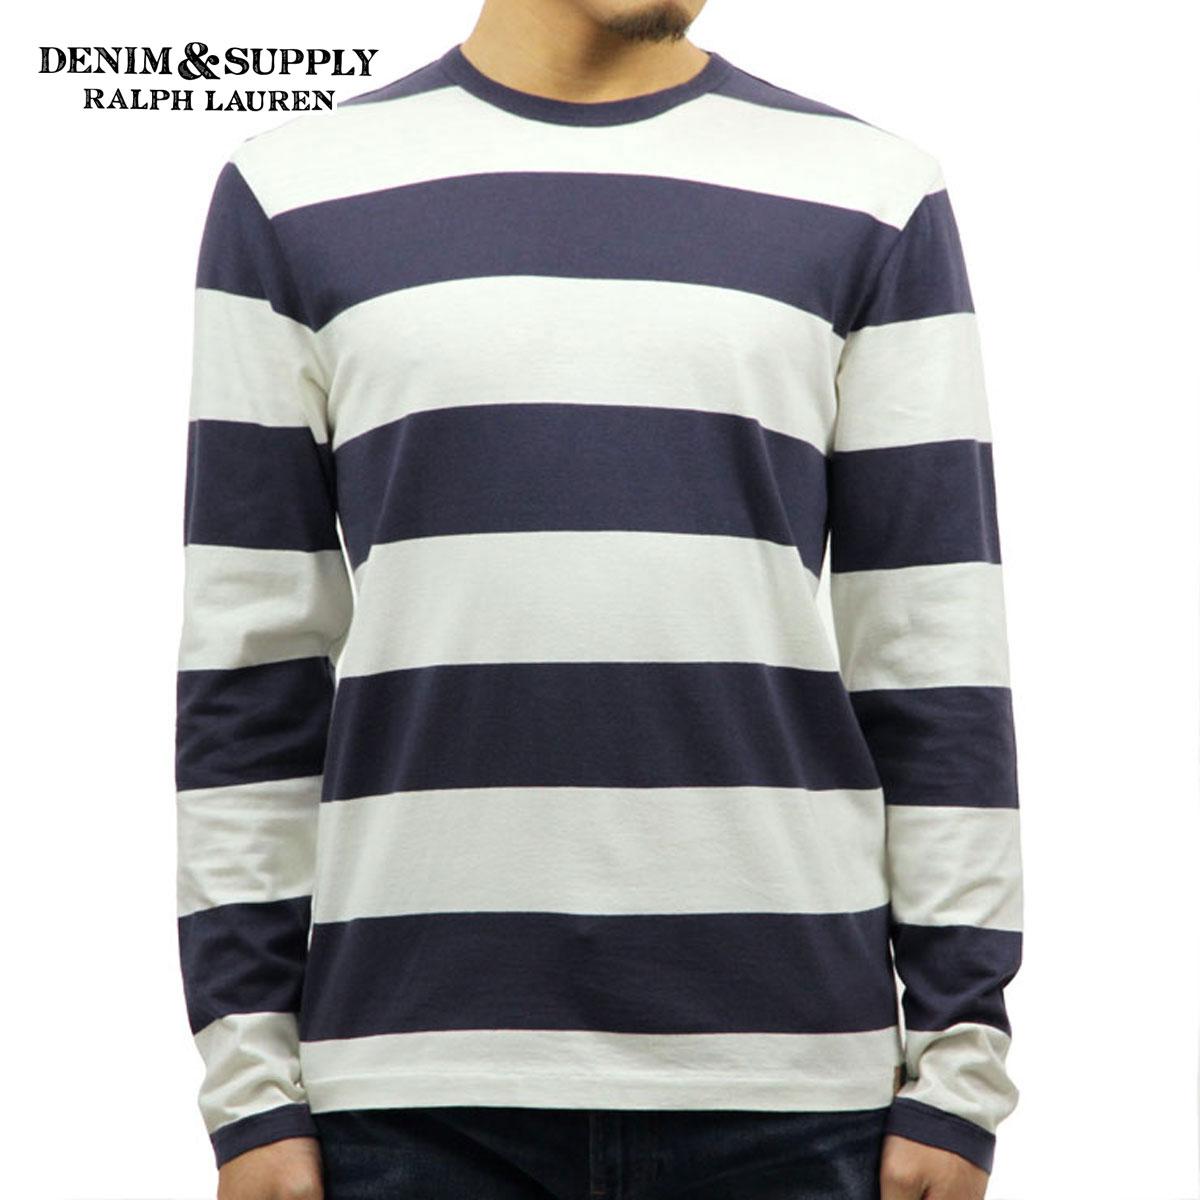 Lauren Cotton Sleeve Articleamp; Men's Regular Denim And T Ralph Tee Supply Striped Shirt Polo Sleeves Long NynOv8mw0